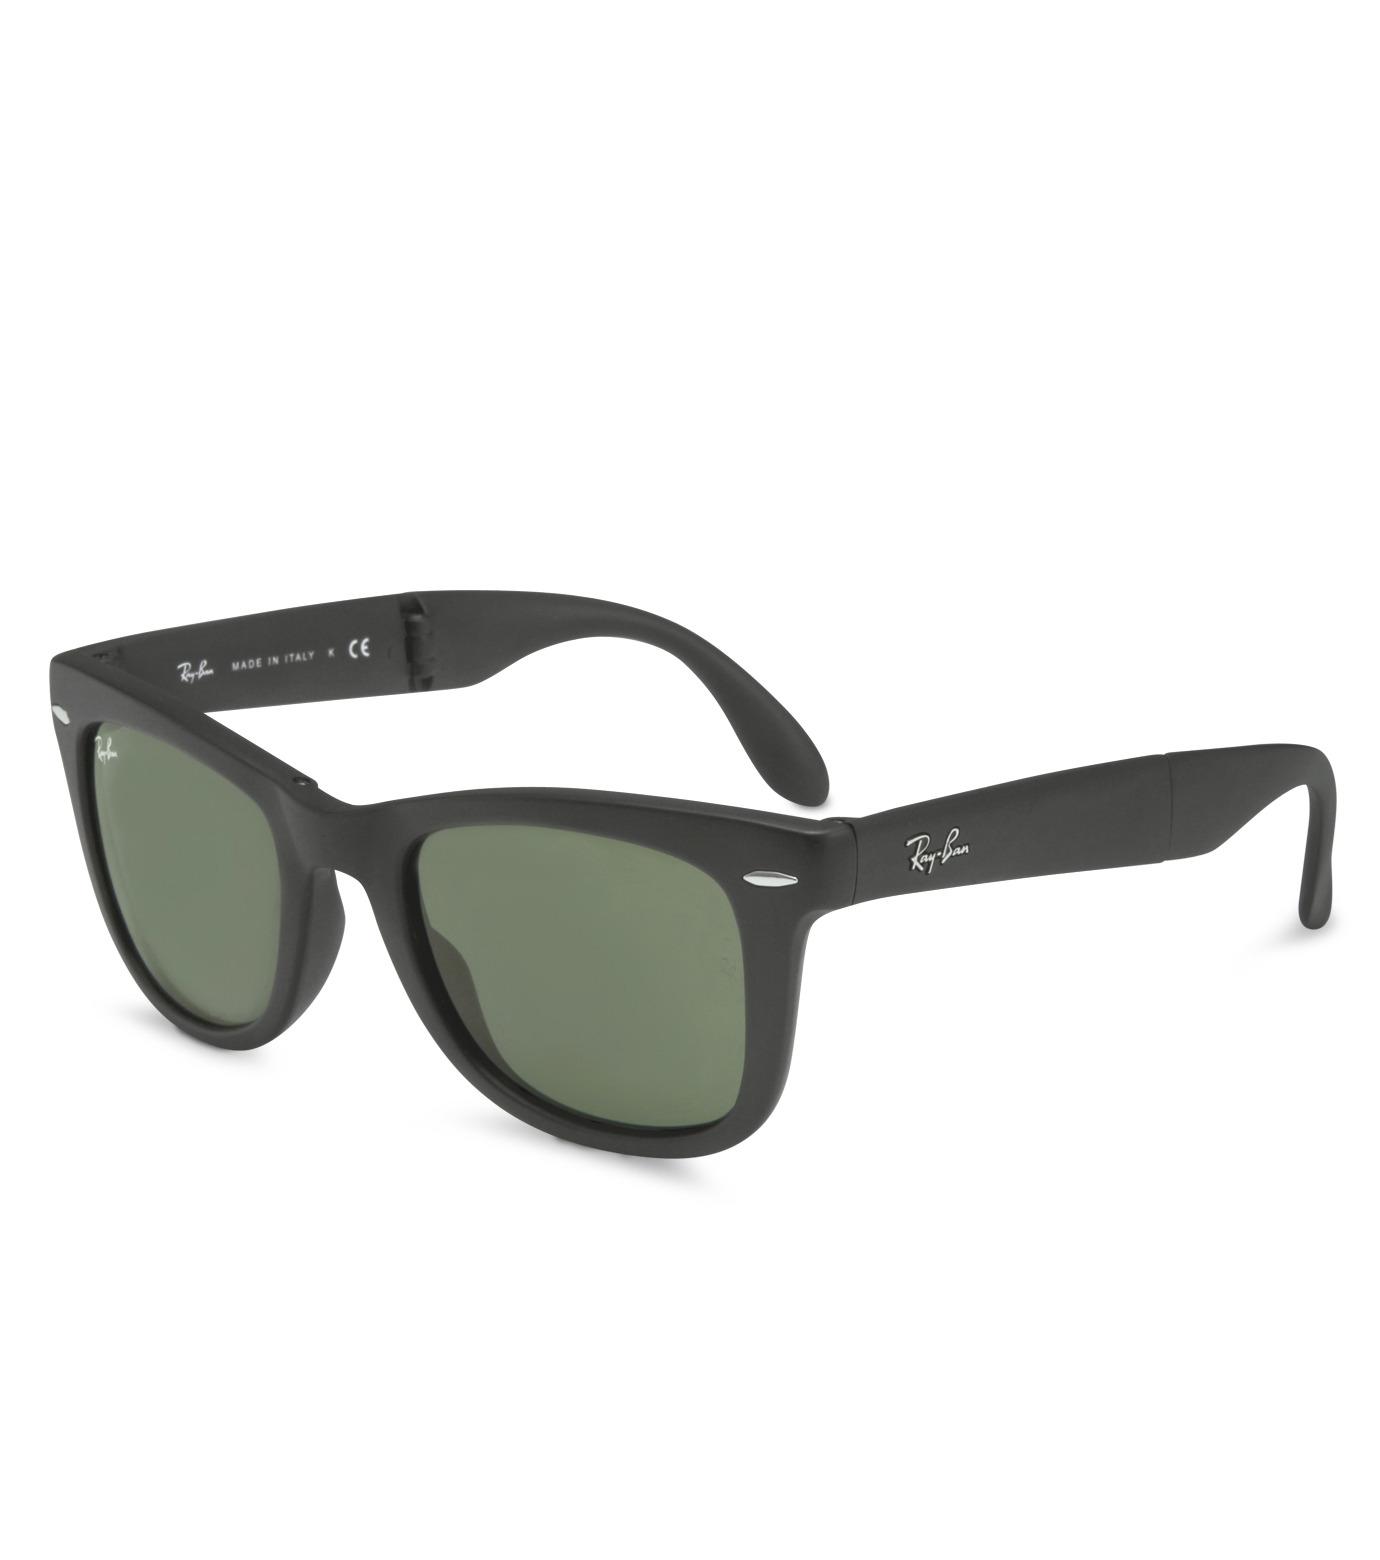 Ray-Ban(レイバン)のWayfarer Matte Black-CHARCHOL GRAY(アイウェア/eyewear)-BR-4105-12 拡大詳細画像1